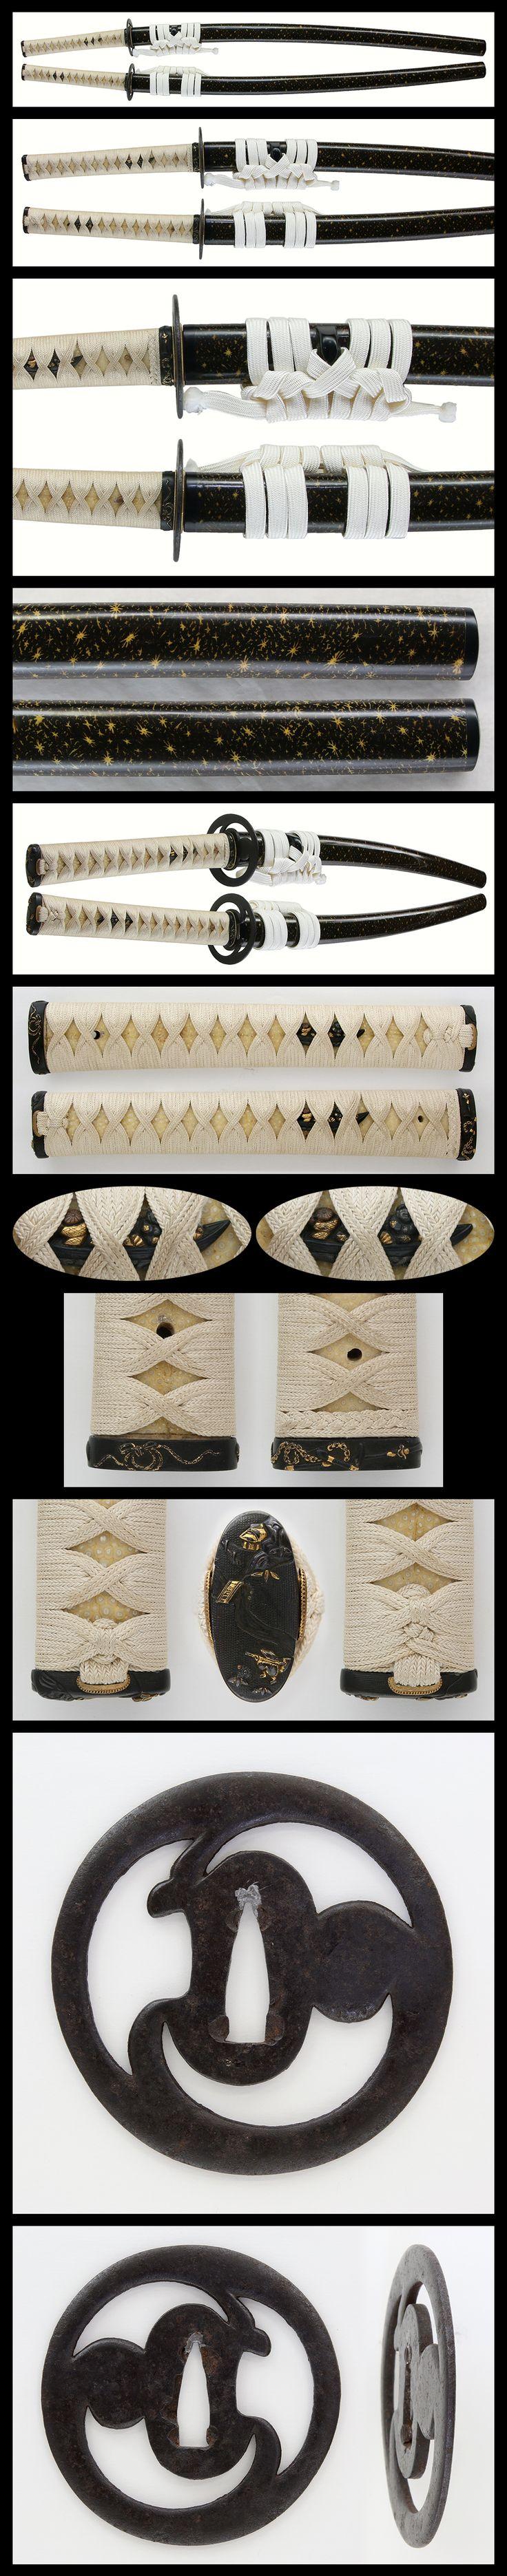 Katana : Mumei (Tegai) | Japanese Sword Shop Aoi-Art.